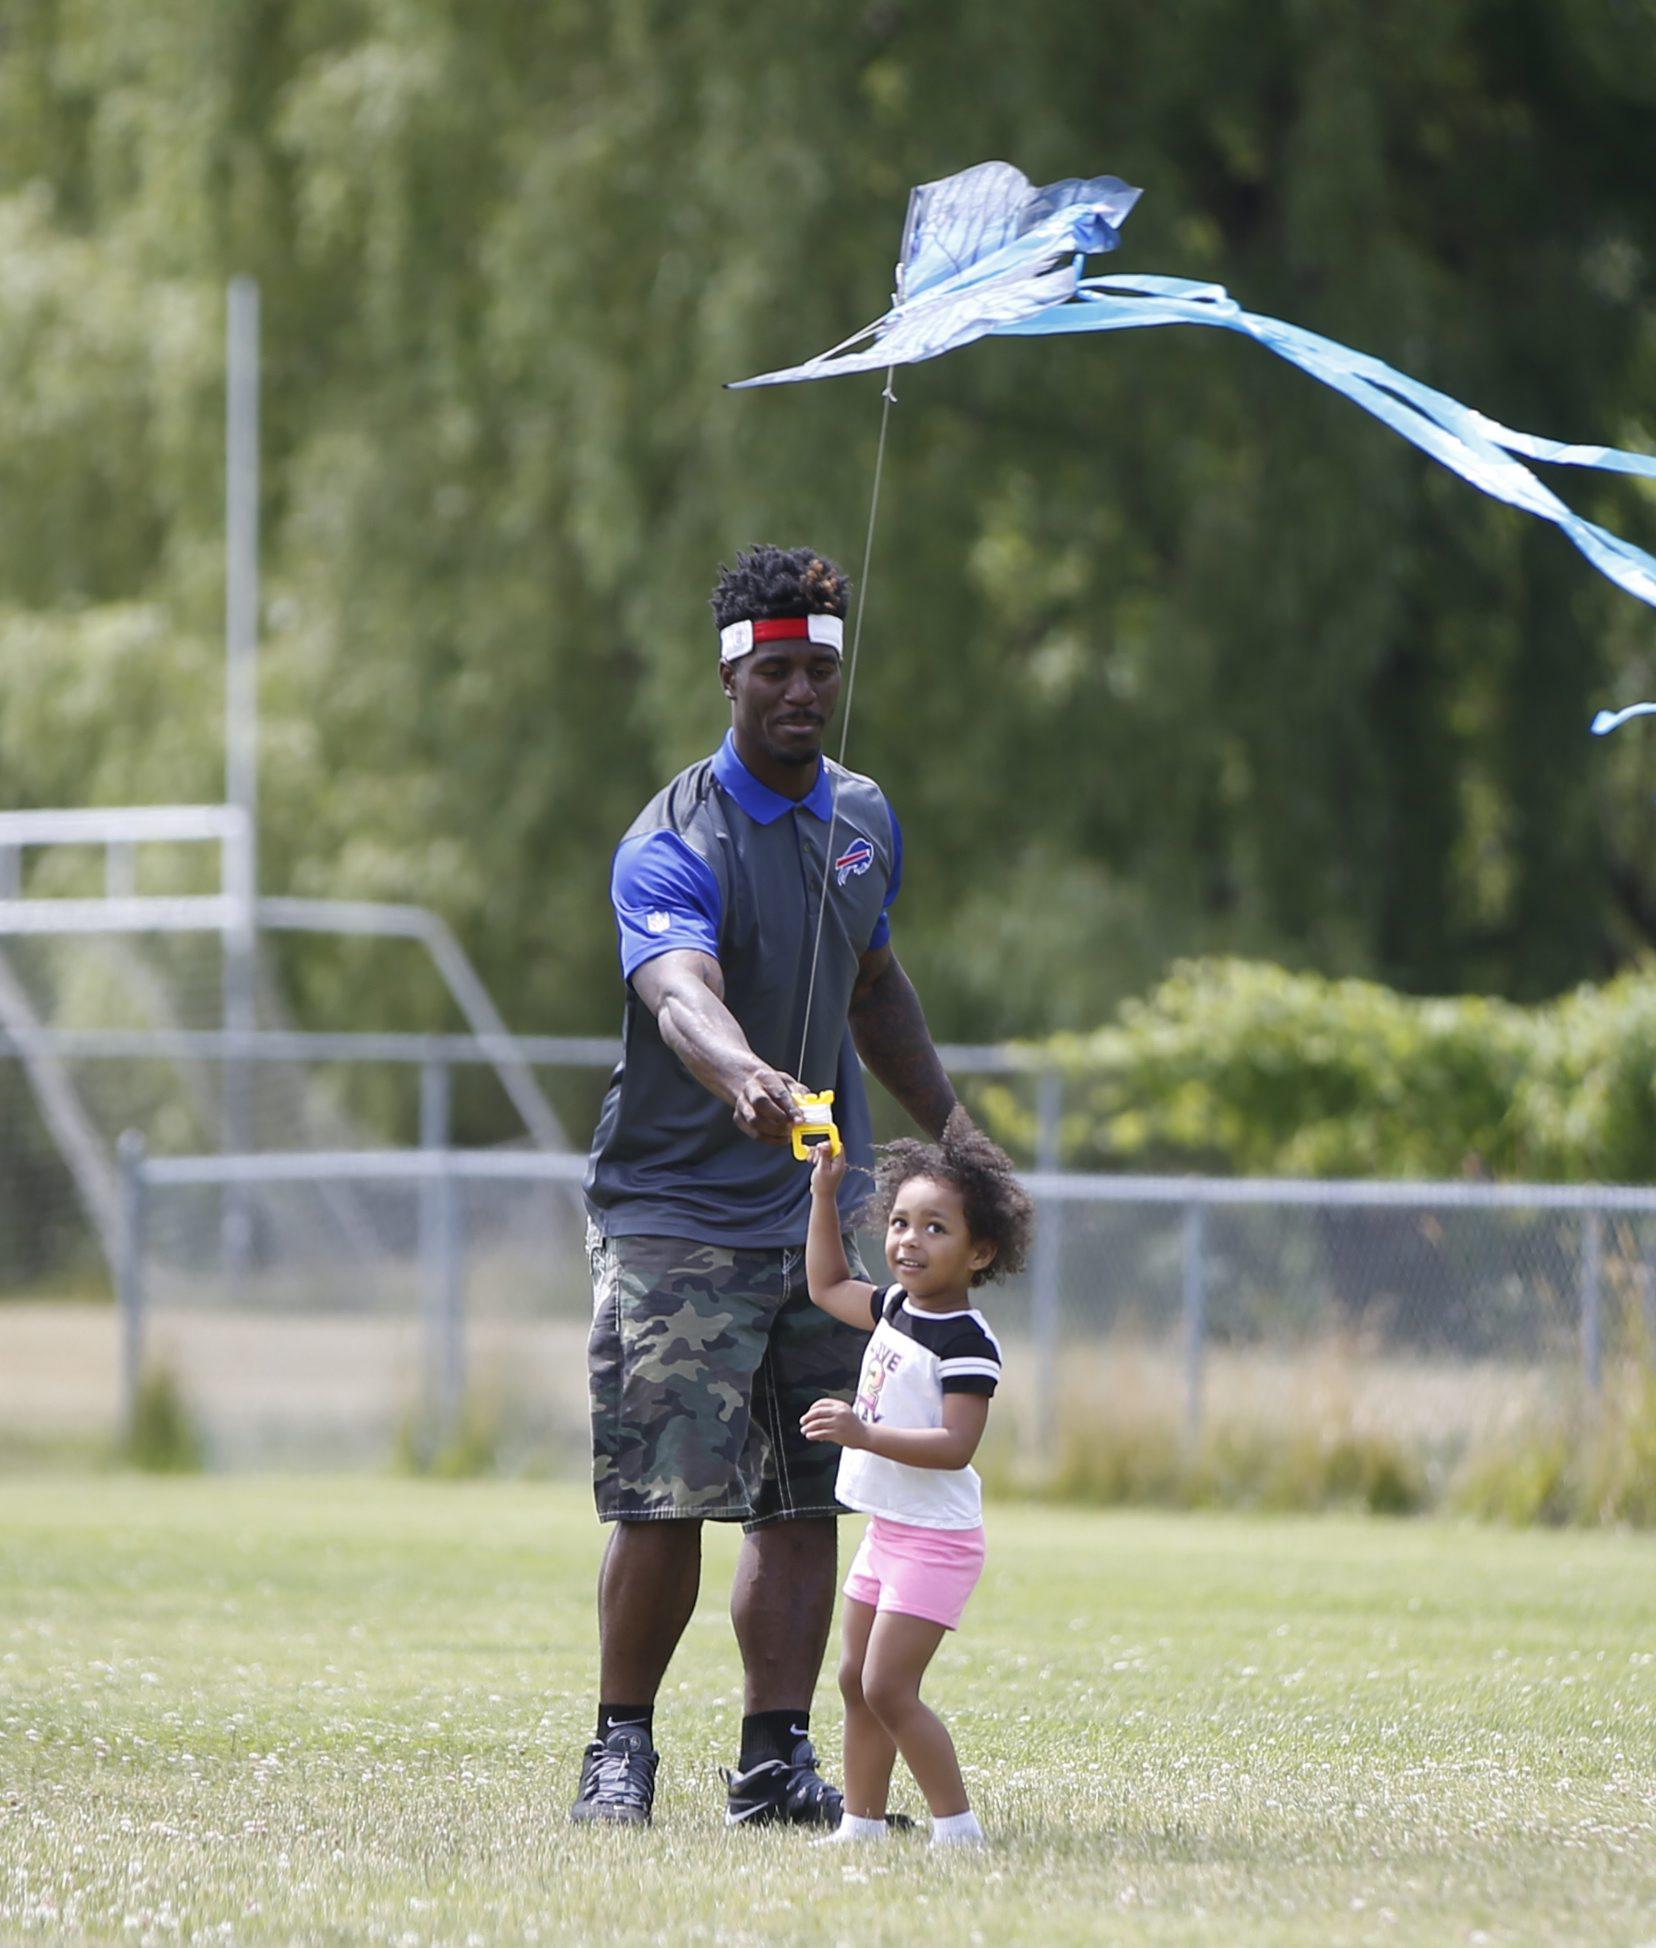 James Wilder flies a kite with his daughter, Nala. (Harry Scull Jr./Buffalo News)